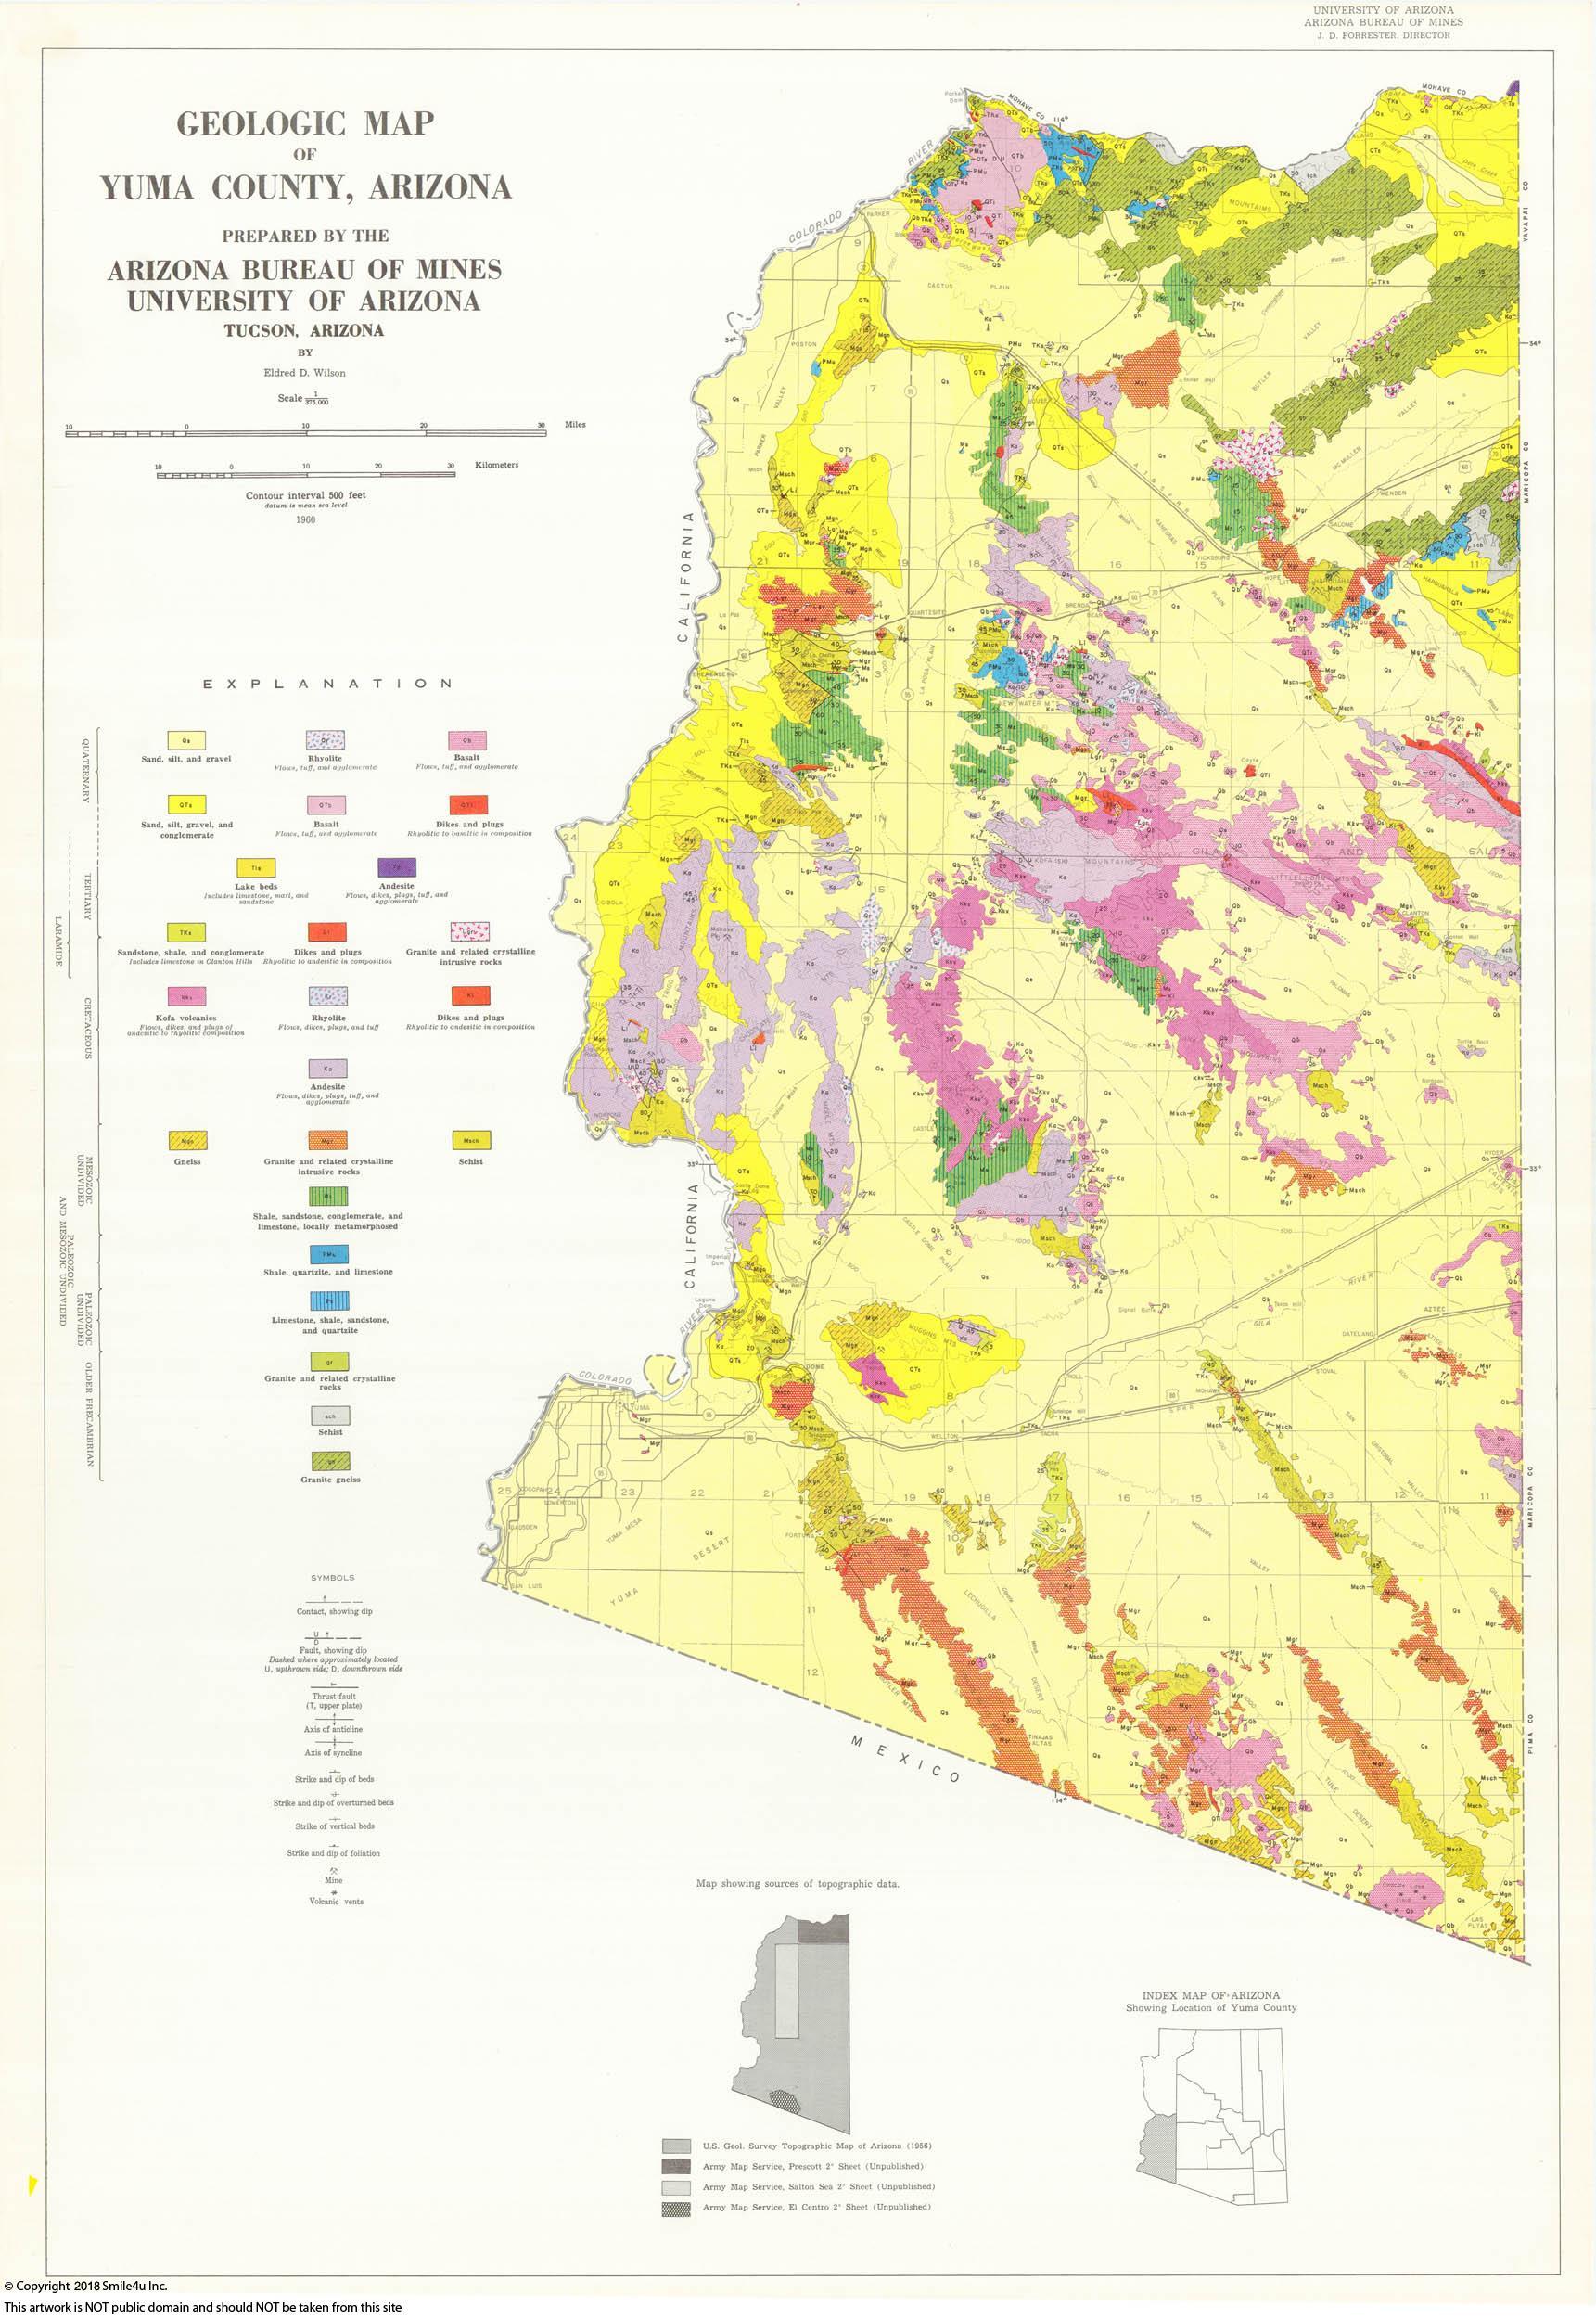 495290_watermarked_yumacounty_1960_geologicmap.jpg